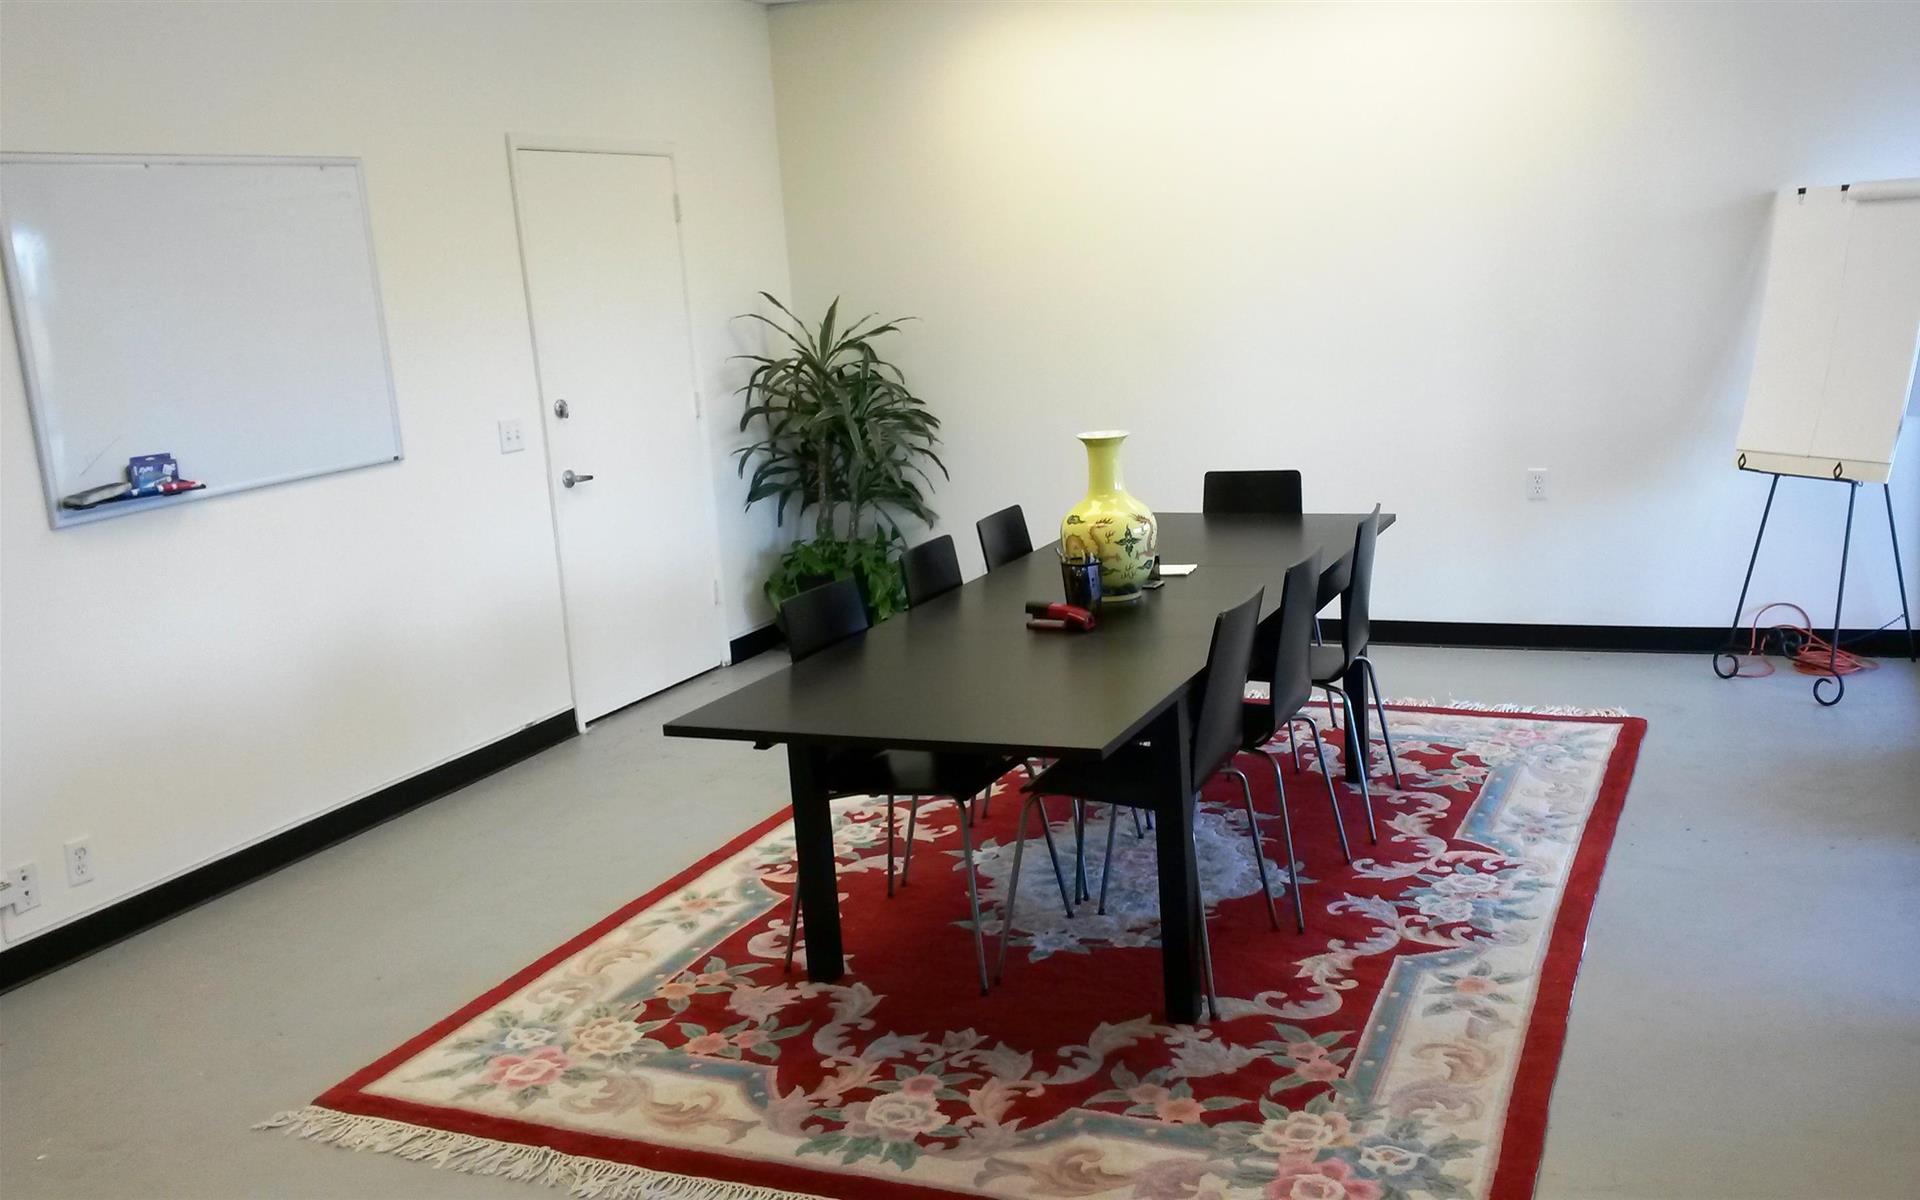 officeLOCALE Coworking Space & Cyberscraper - Space 1 - Right Side Door